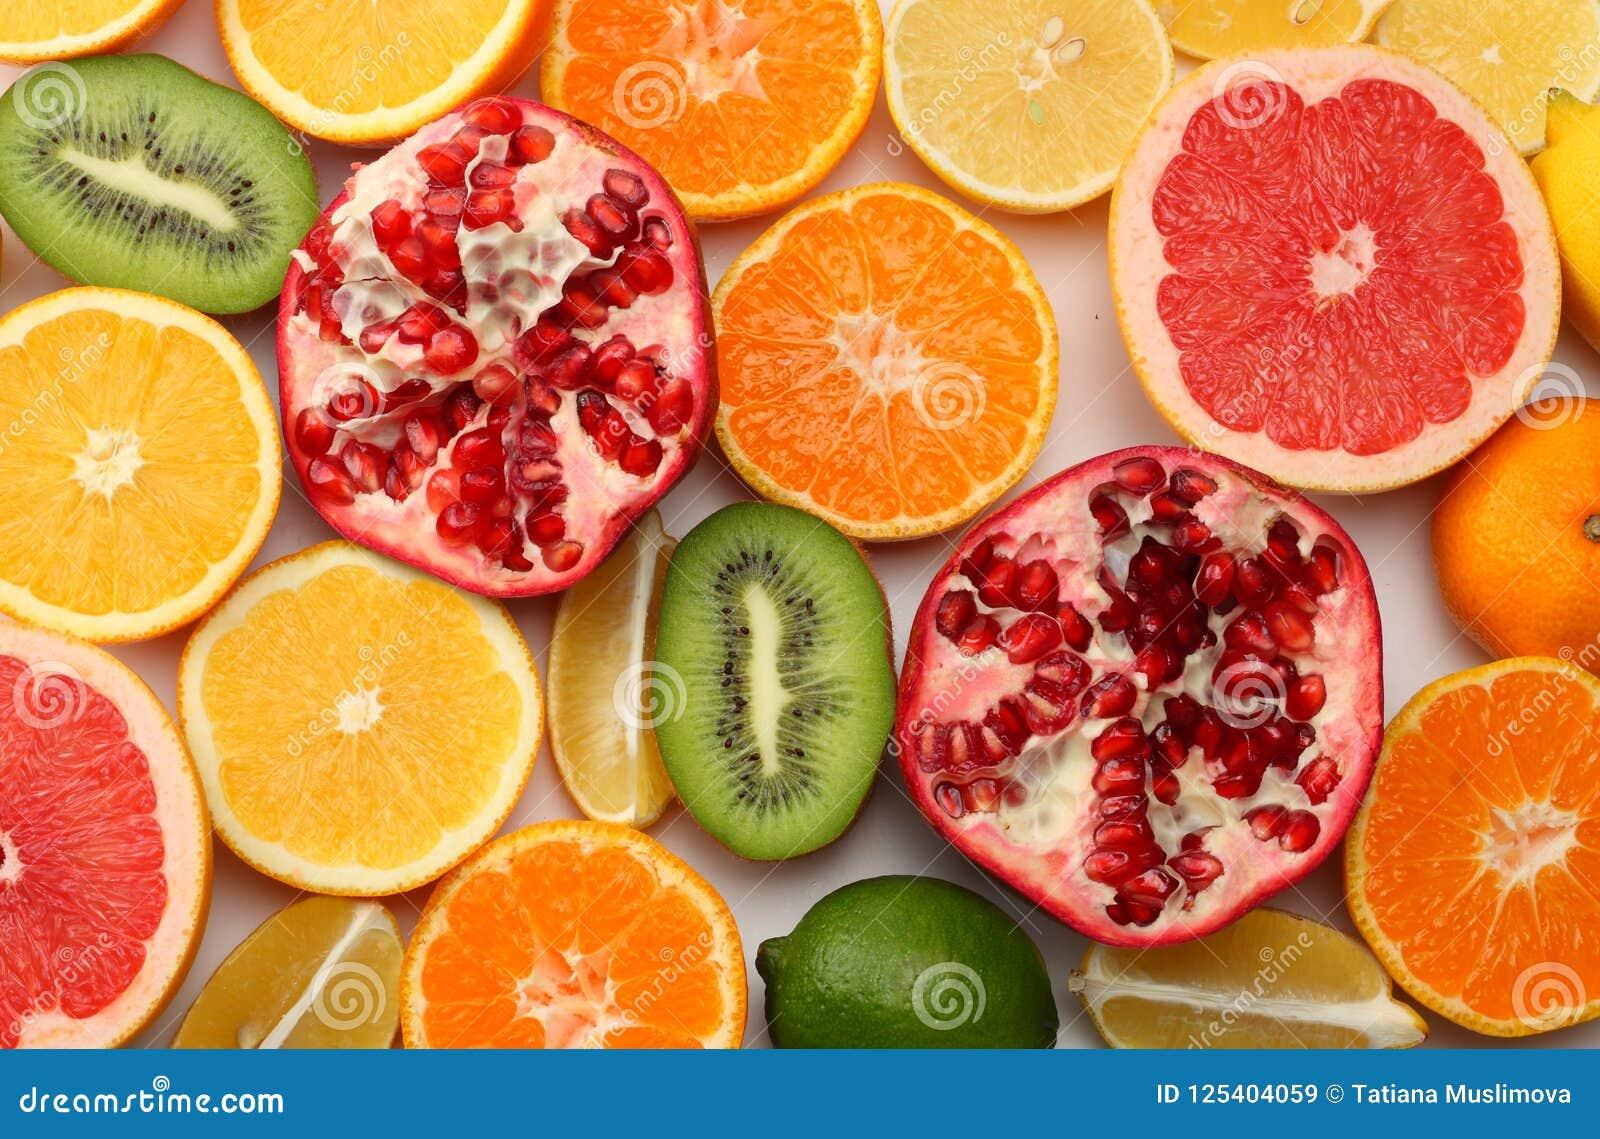 Gezond voedsel de mengeling sneed citroen, groene die kalk, sinaasappel, mandarin, kiwifruit en grapefruit op witte achtergrond w